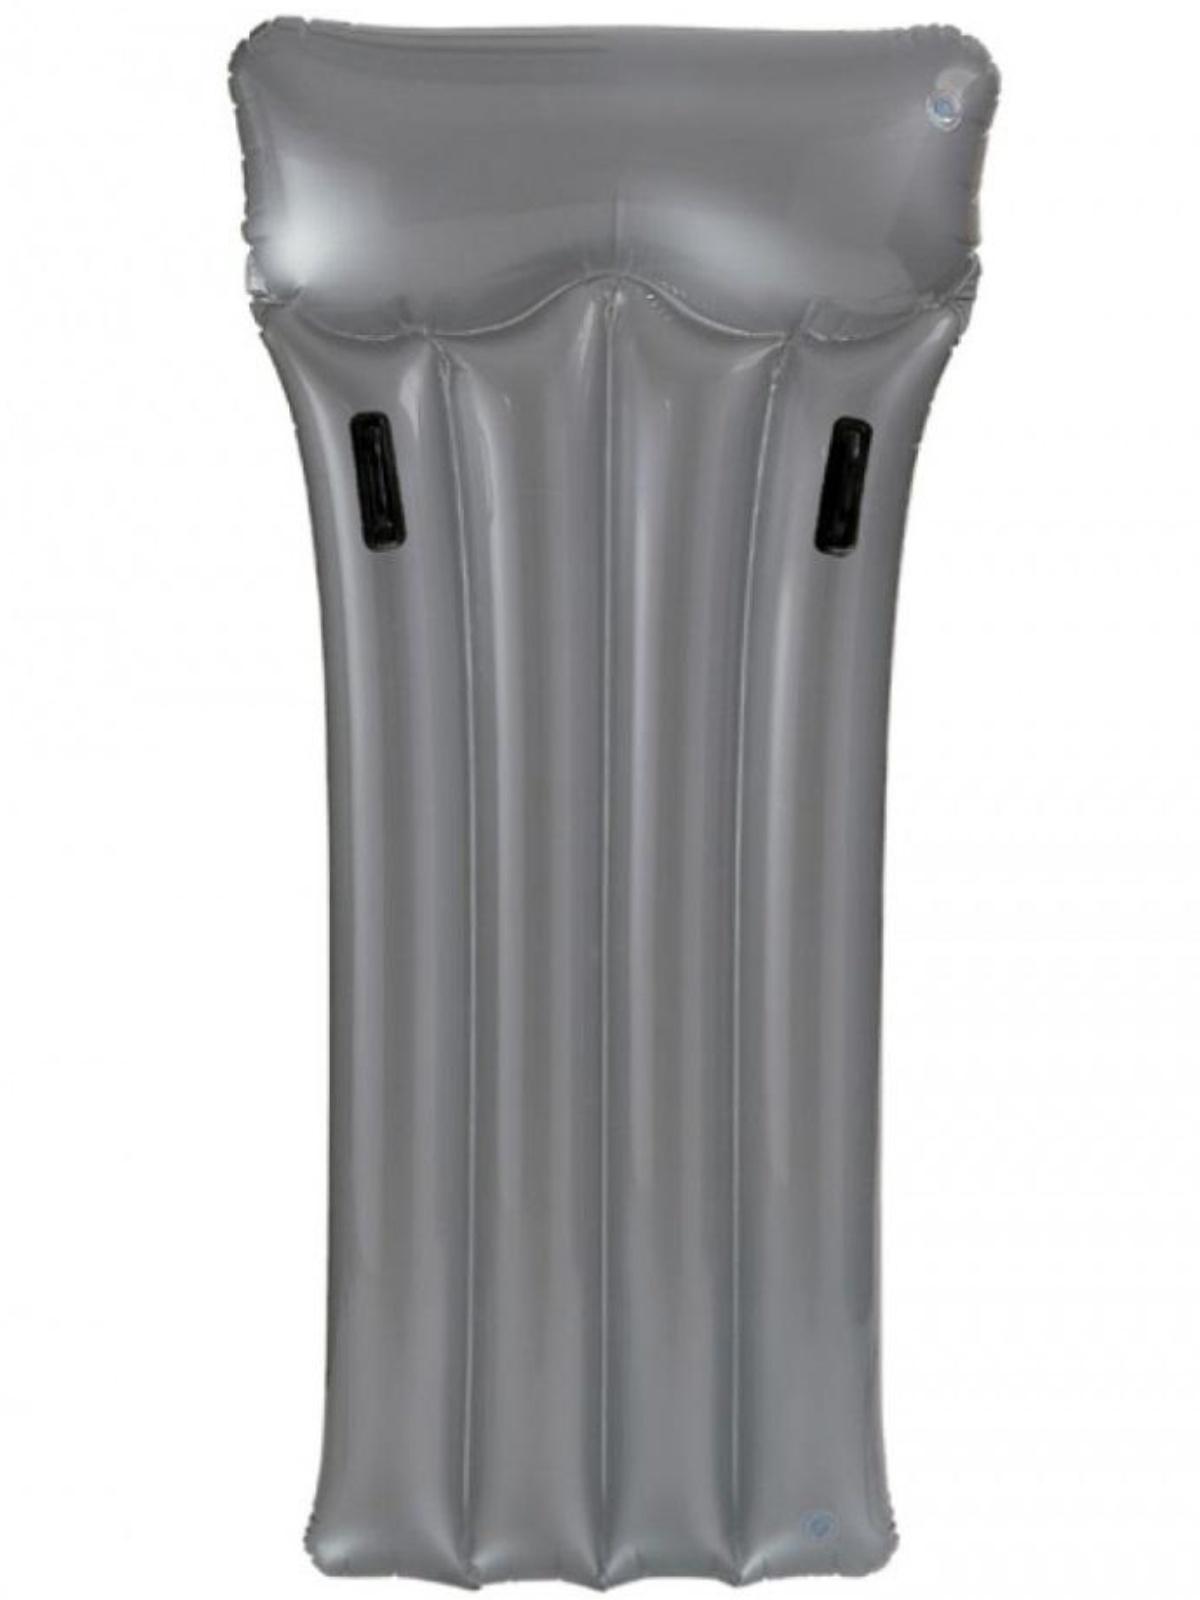 Nafukovací lehátko INTEX Deluxe s držadly 188 x 89 cm